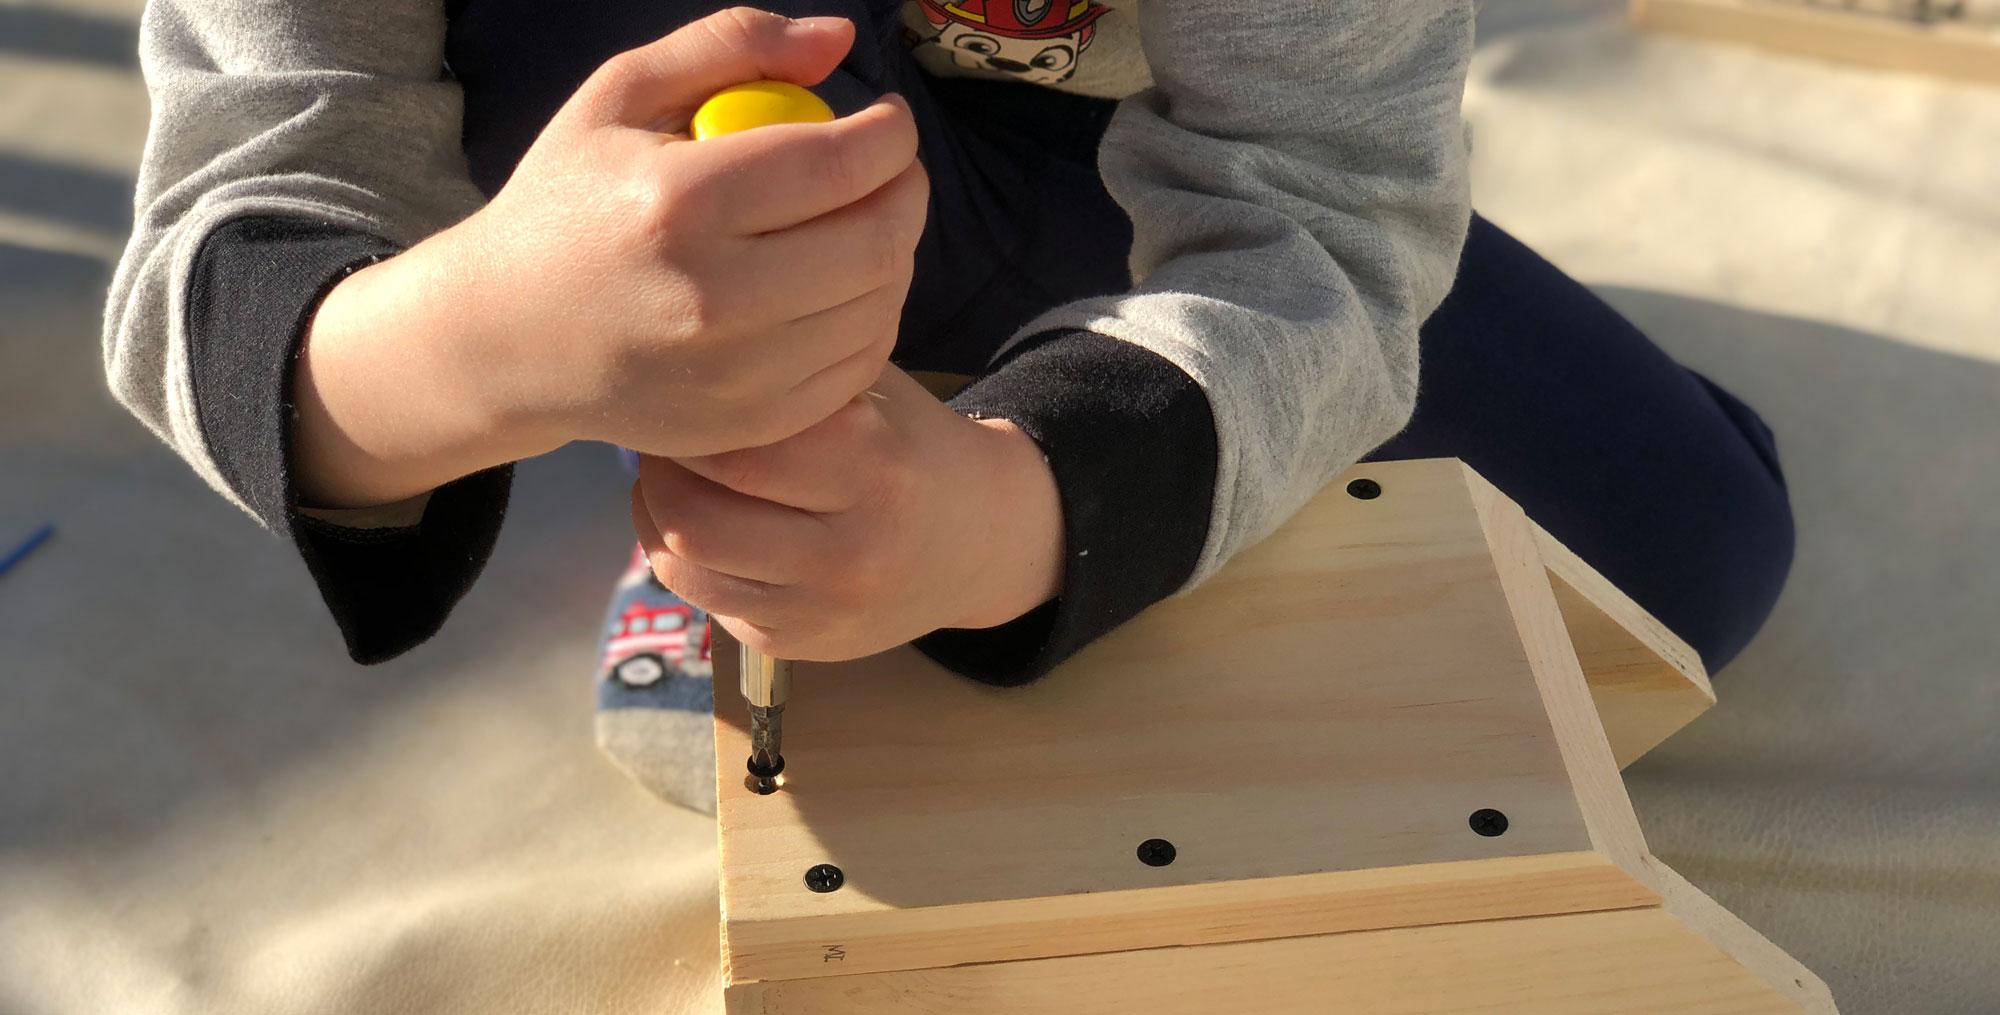 Boy building a bird house